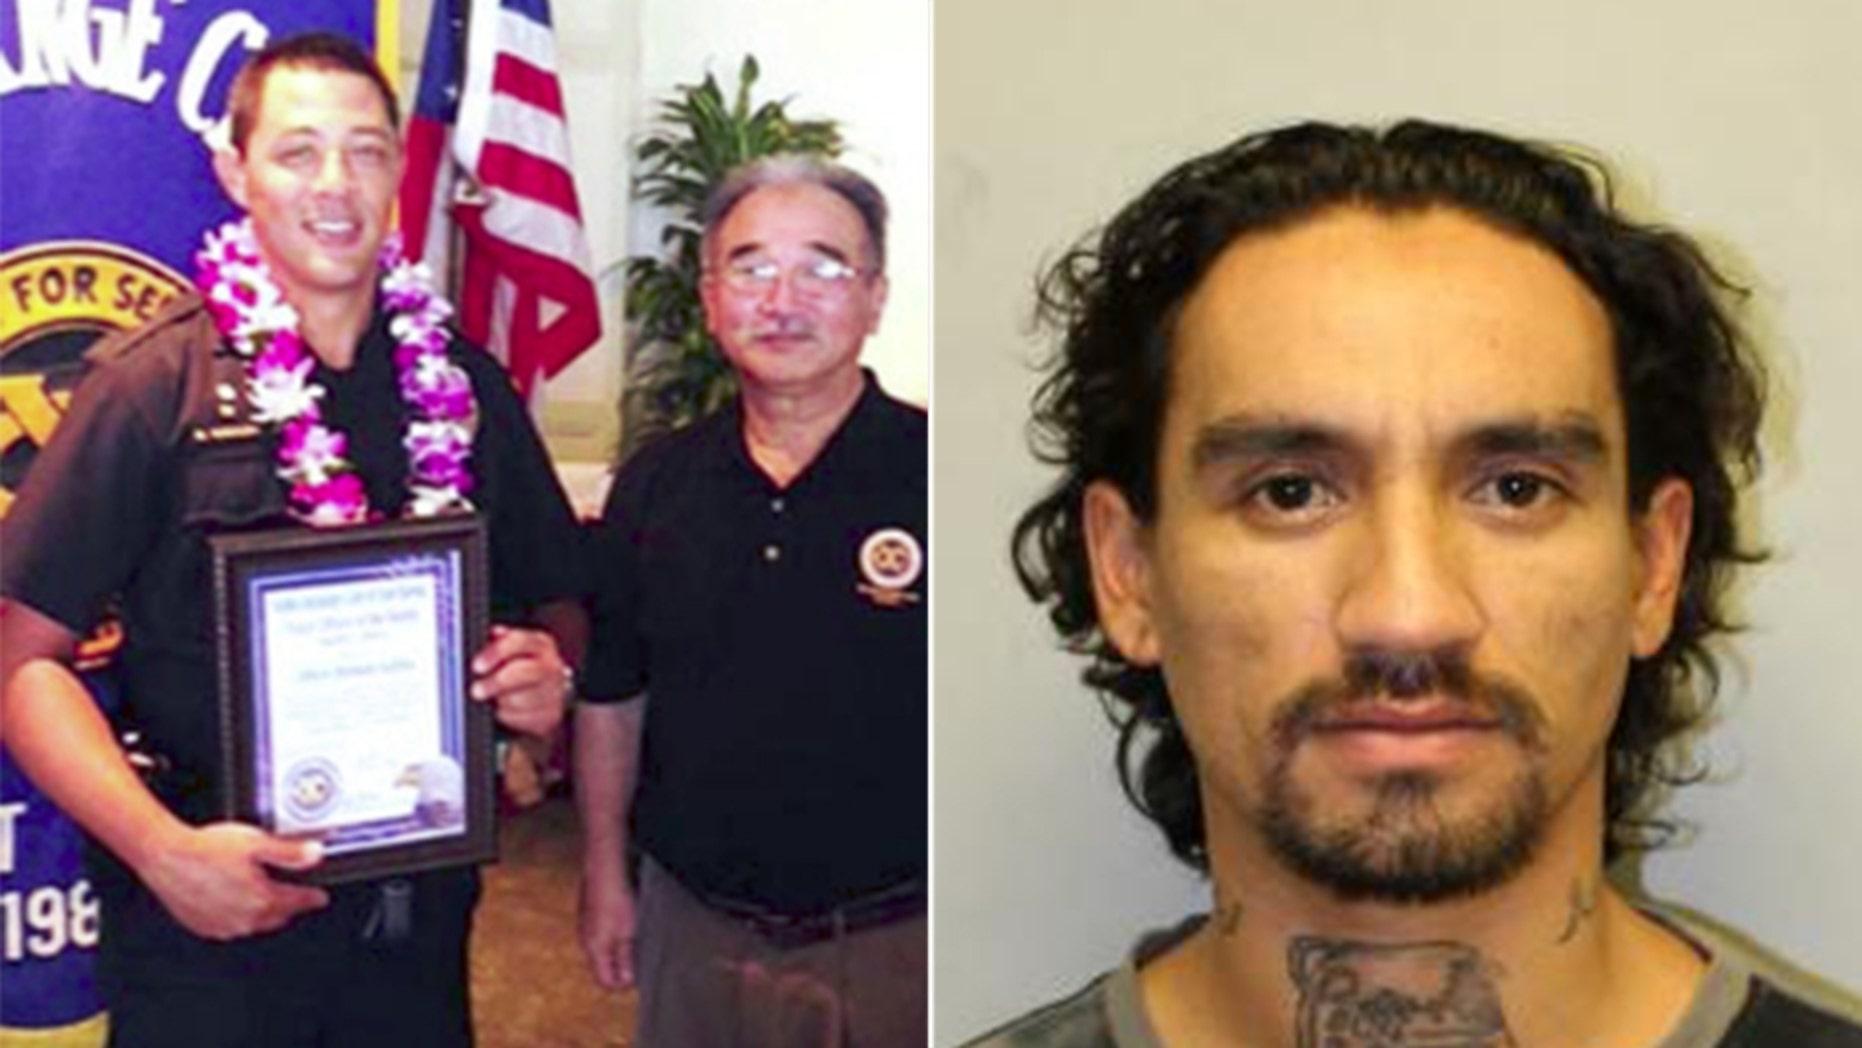 Justin Joshua Waiki, shot and killed Officer Bronson K. Kaliloa during a traffic stop on Hawaii's Big Island on Tuesday, according to police.